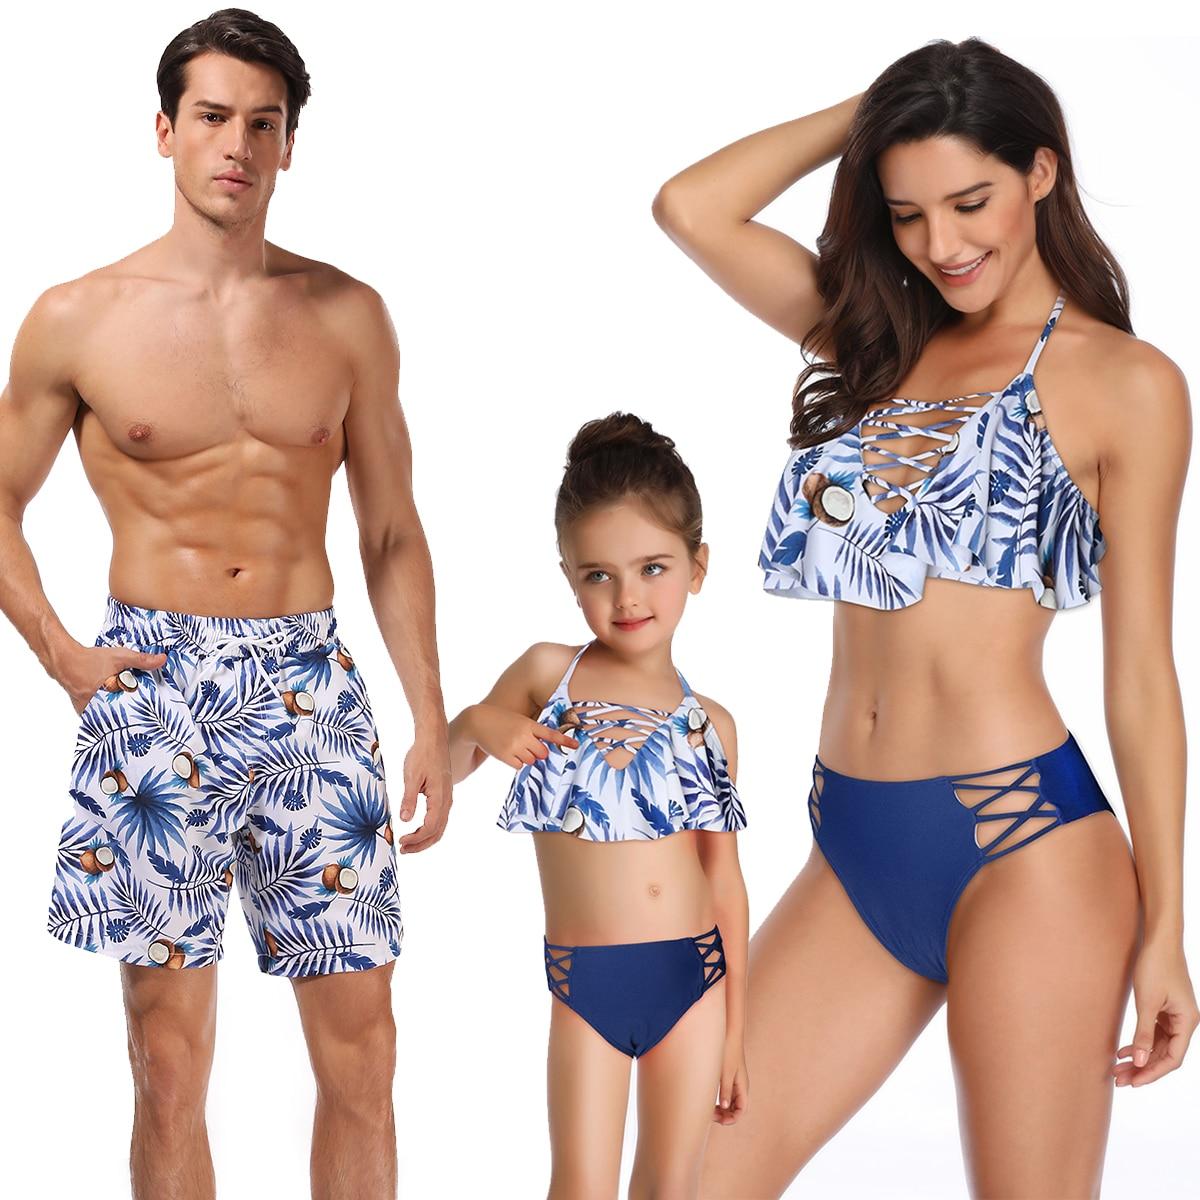 Eolgo Mens Swim Trunks Hawaiian Plus Size Surfing Running Beach Shorts Quick Dry Zipper Swimming Cool Comfortable Pant